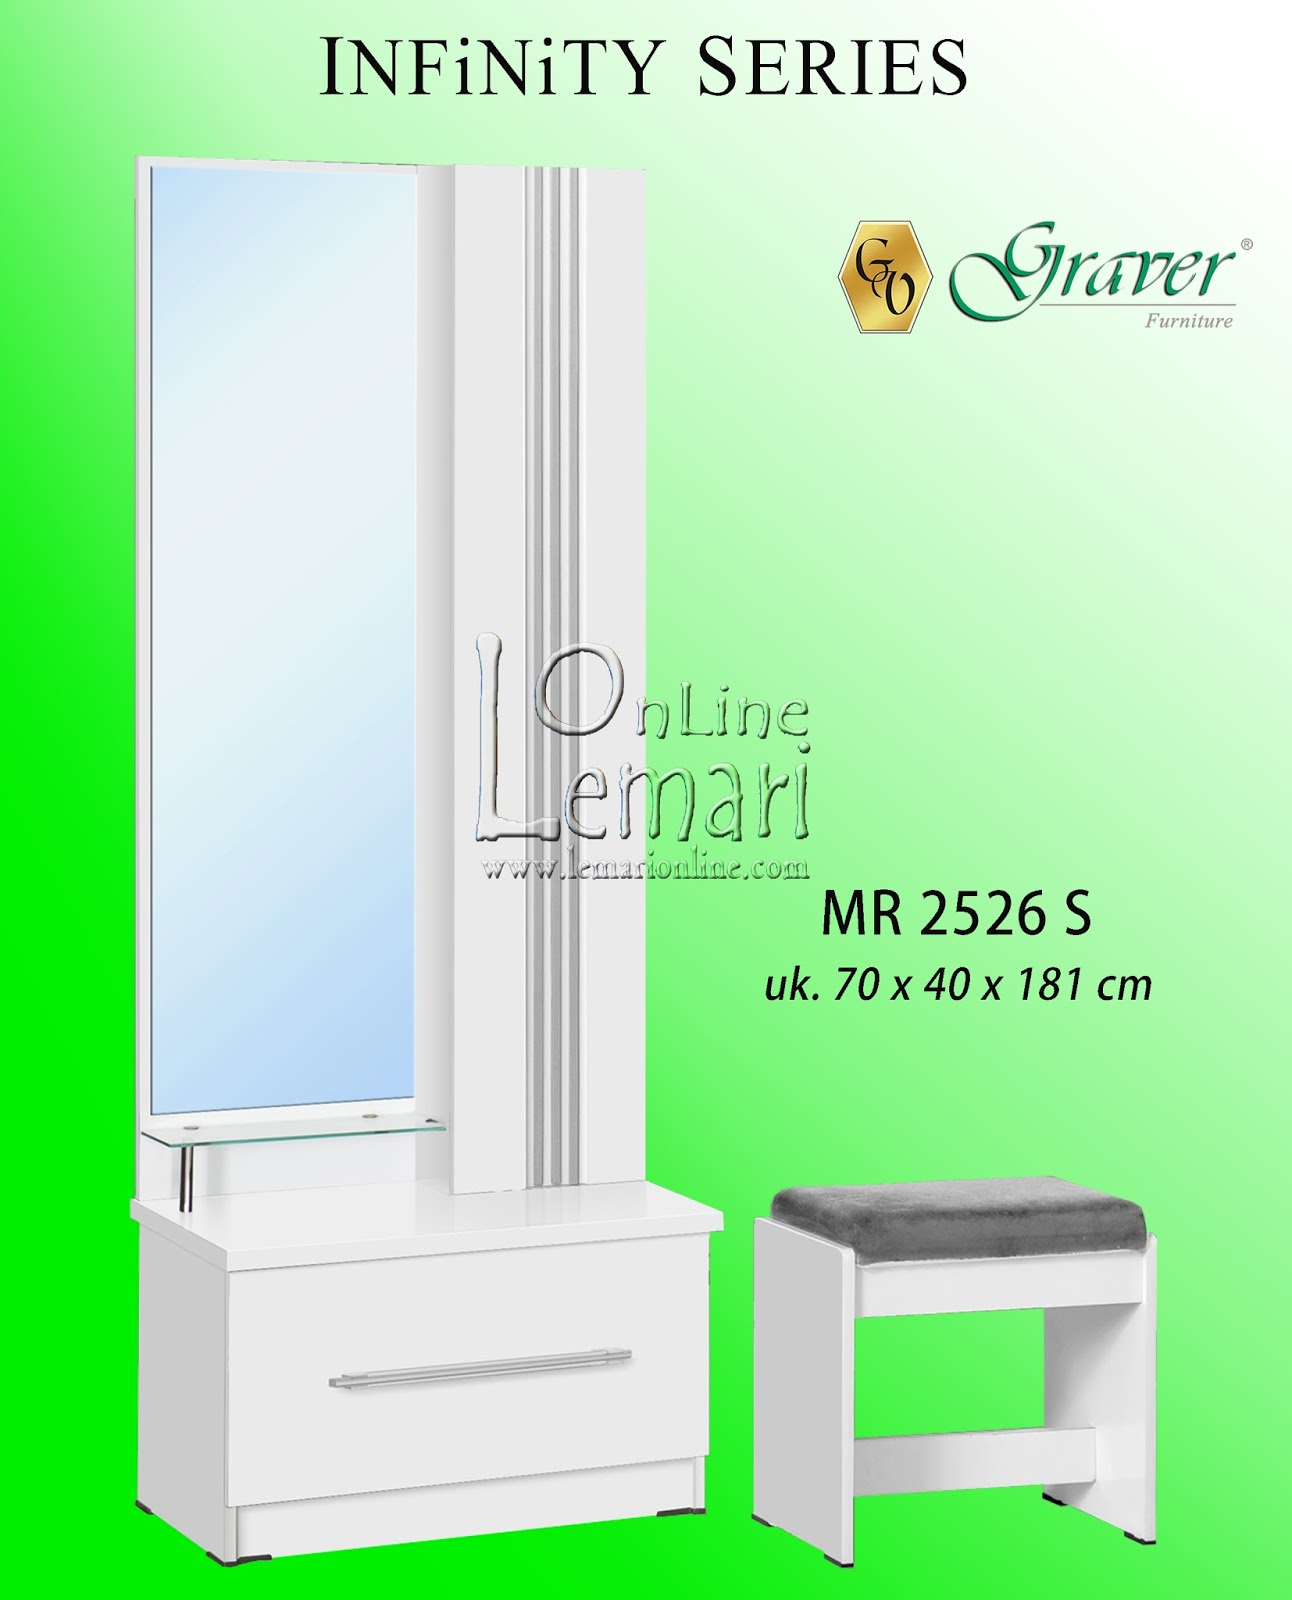 Graver Furniture Meja Rias Mr 92262 Daftar Harga Terkini Fcenter Siantano 905 Jawa Tengahdiyjawa Timur